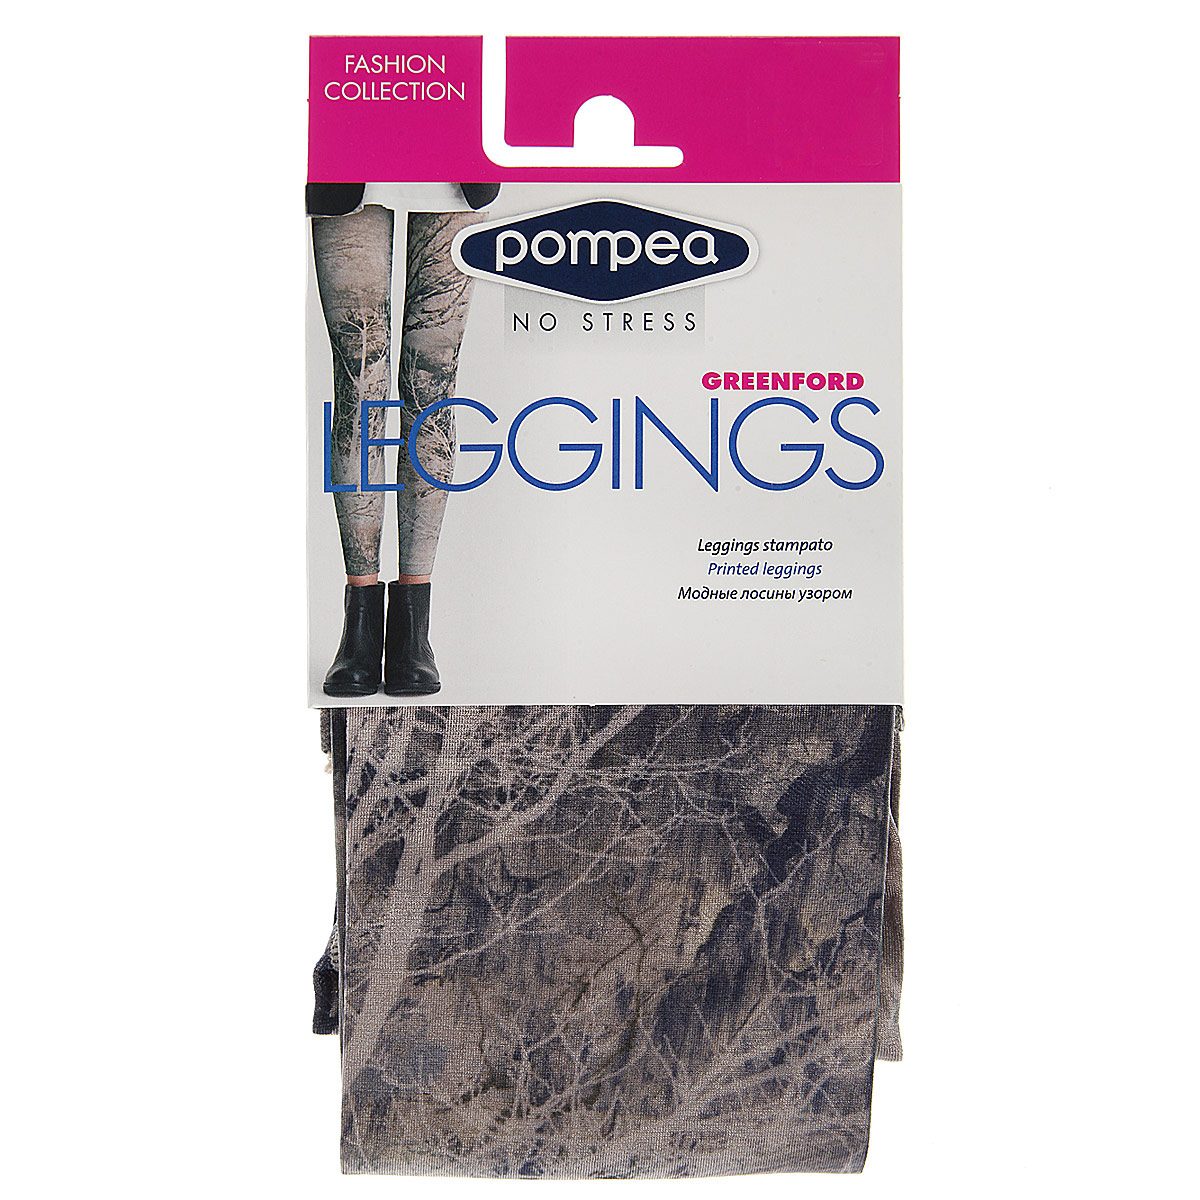 Леггинсы женские Pompea Leggings Greenford Fashion, цвет: Nature (природа). Размер 2 (1/2-S) smeg fa390x3